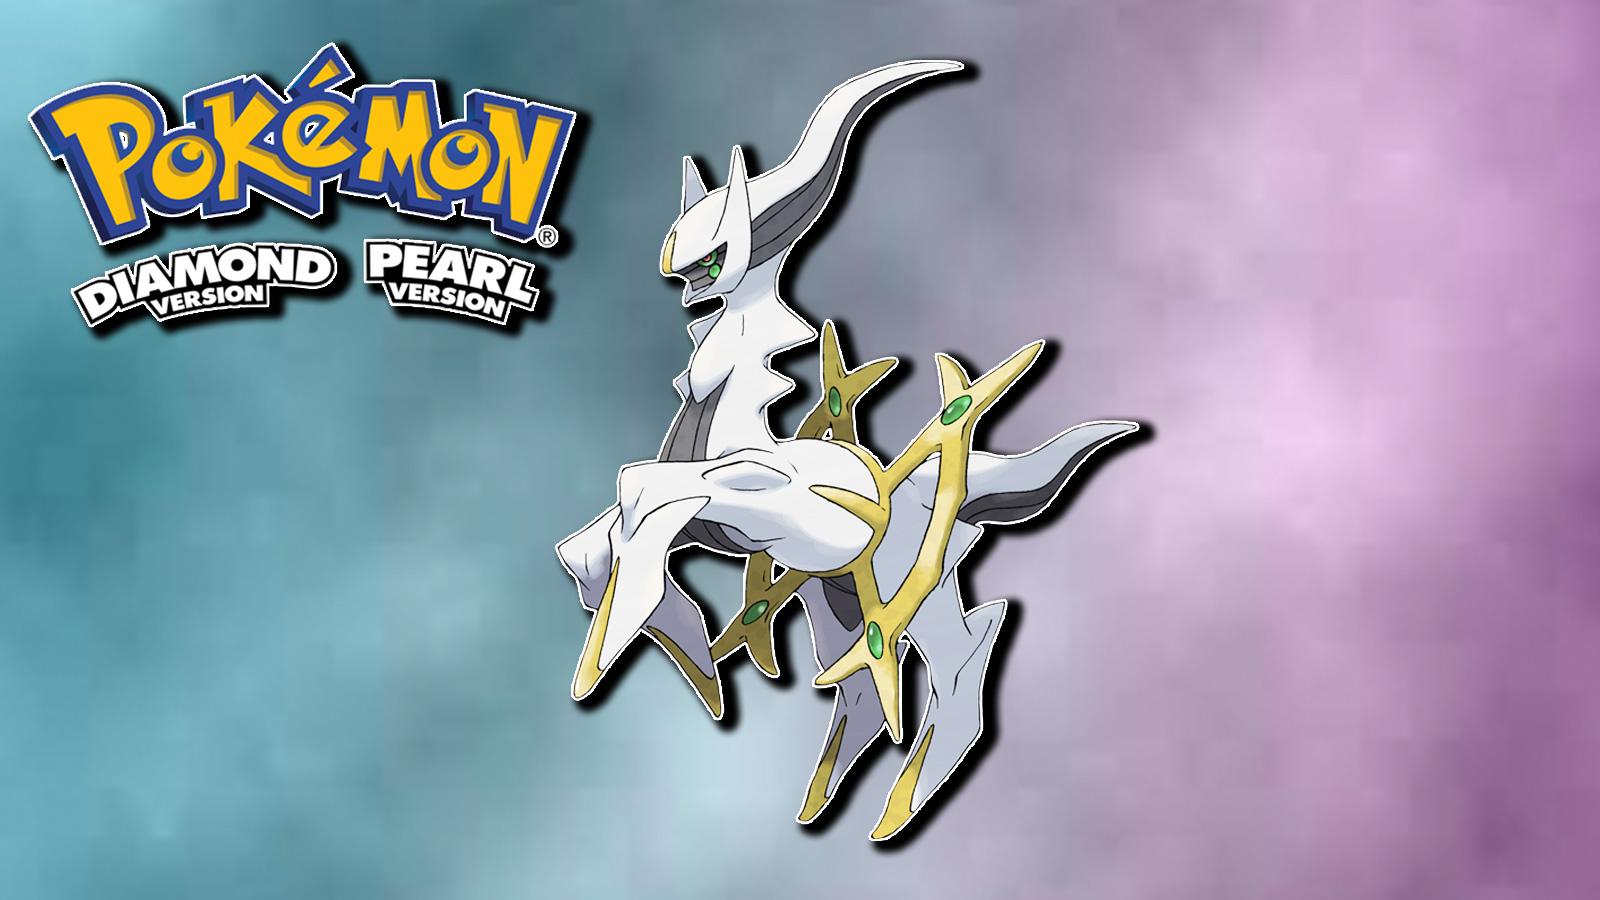 Screenshot of Legendary Pokemon Acreus next to Diamond & Pearl logo.